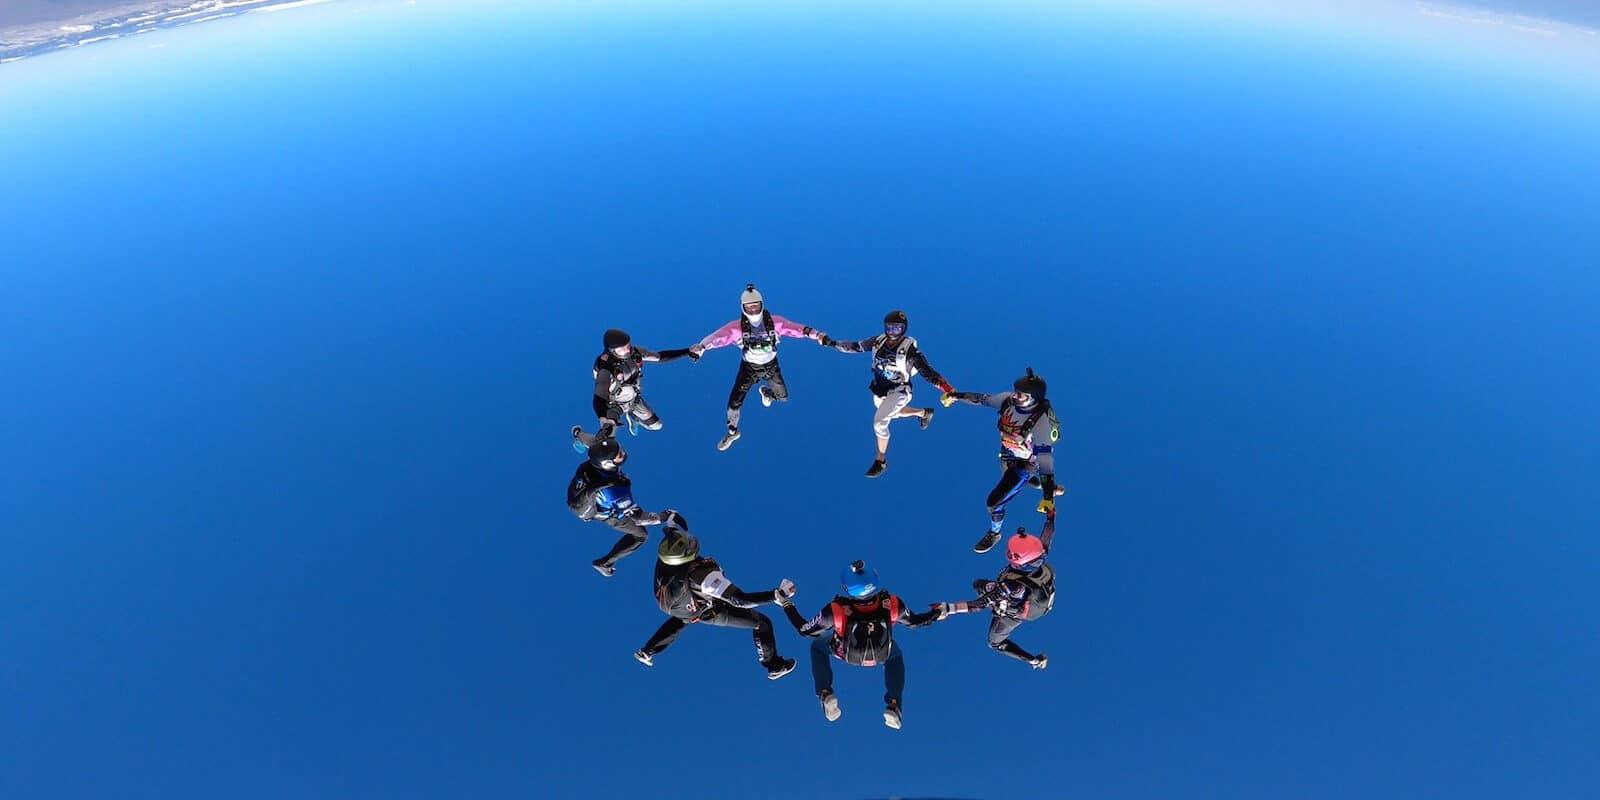 Image of Ultimate Skydiving Adventures skydivers in Colorado